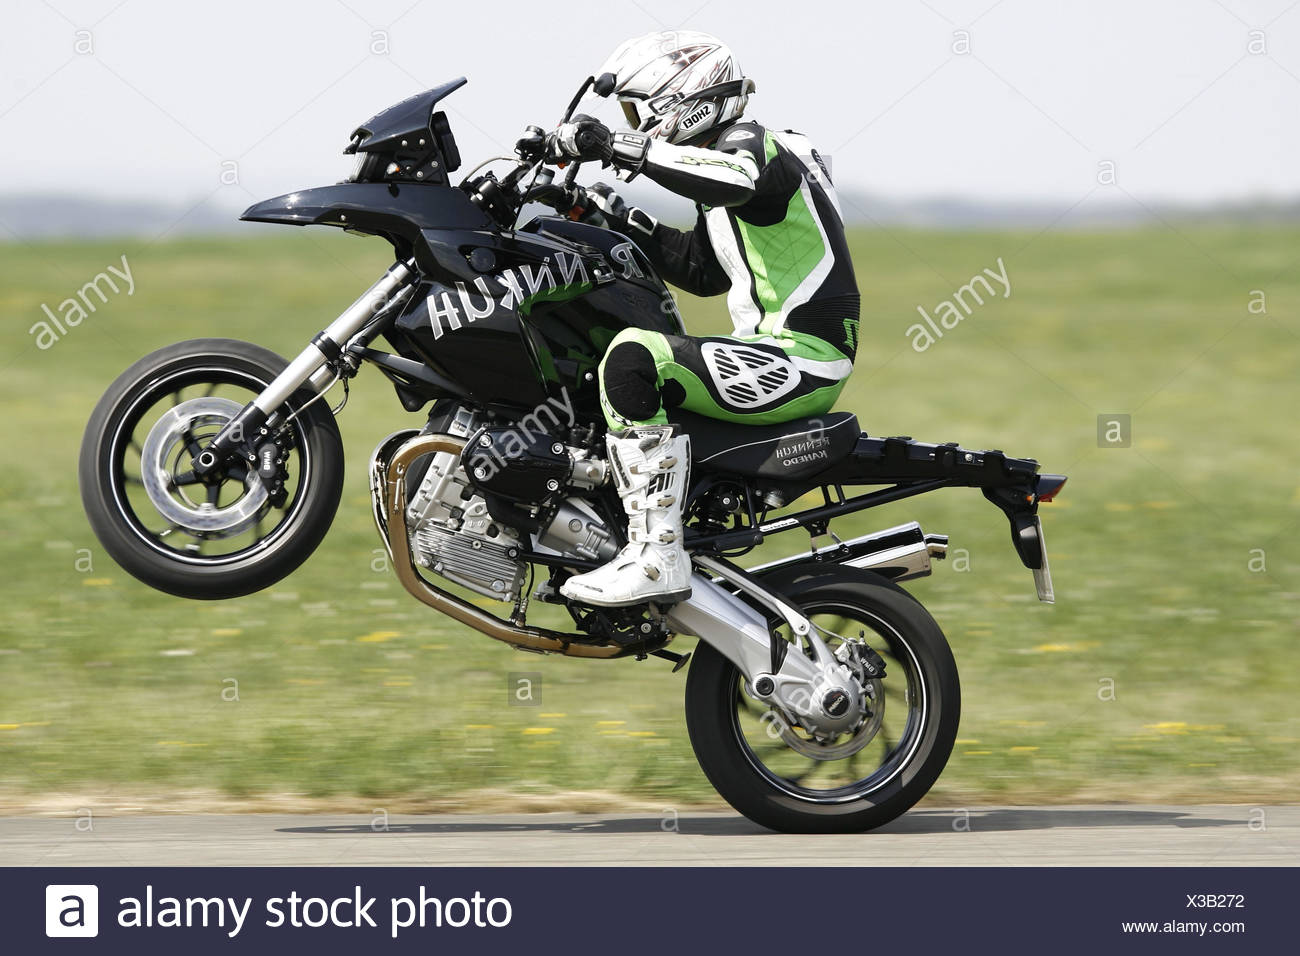 Motorcycle BMW GS Rebuilding Stock Photo: 277453094 - Alamy